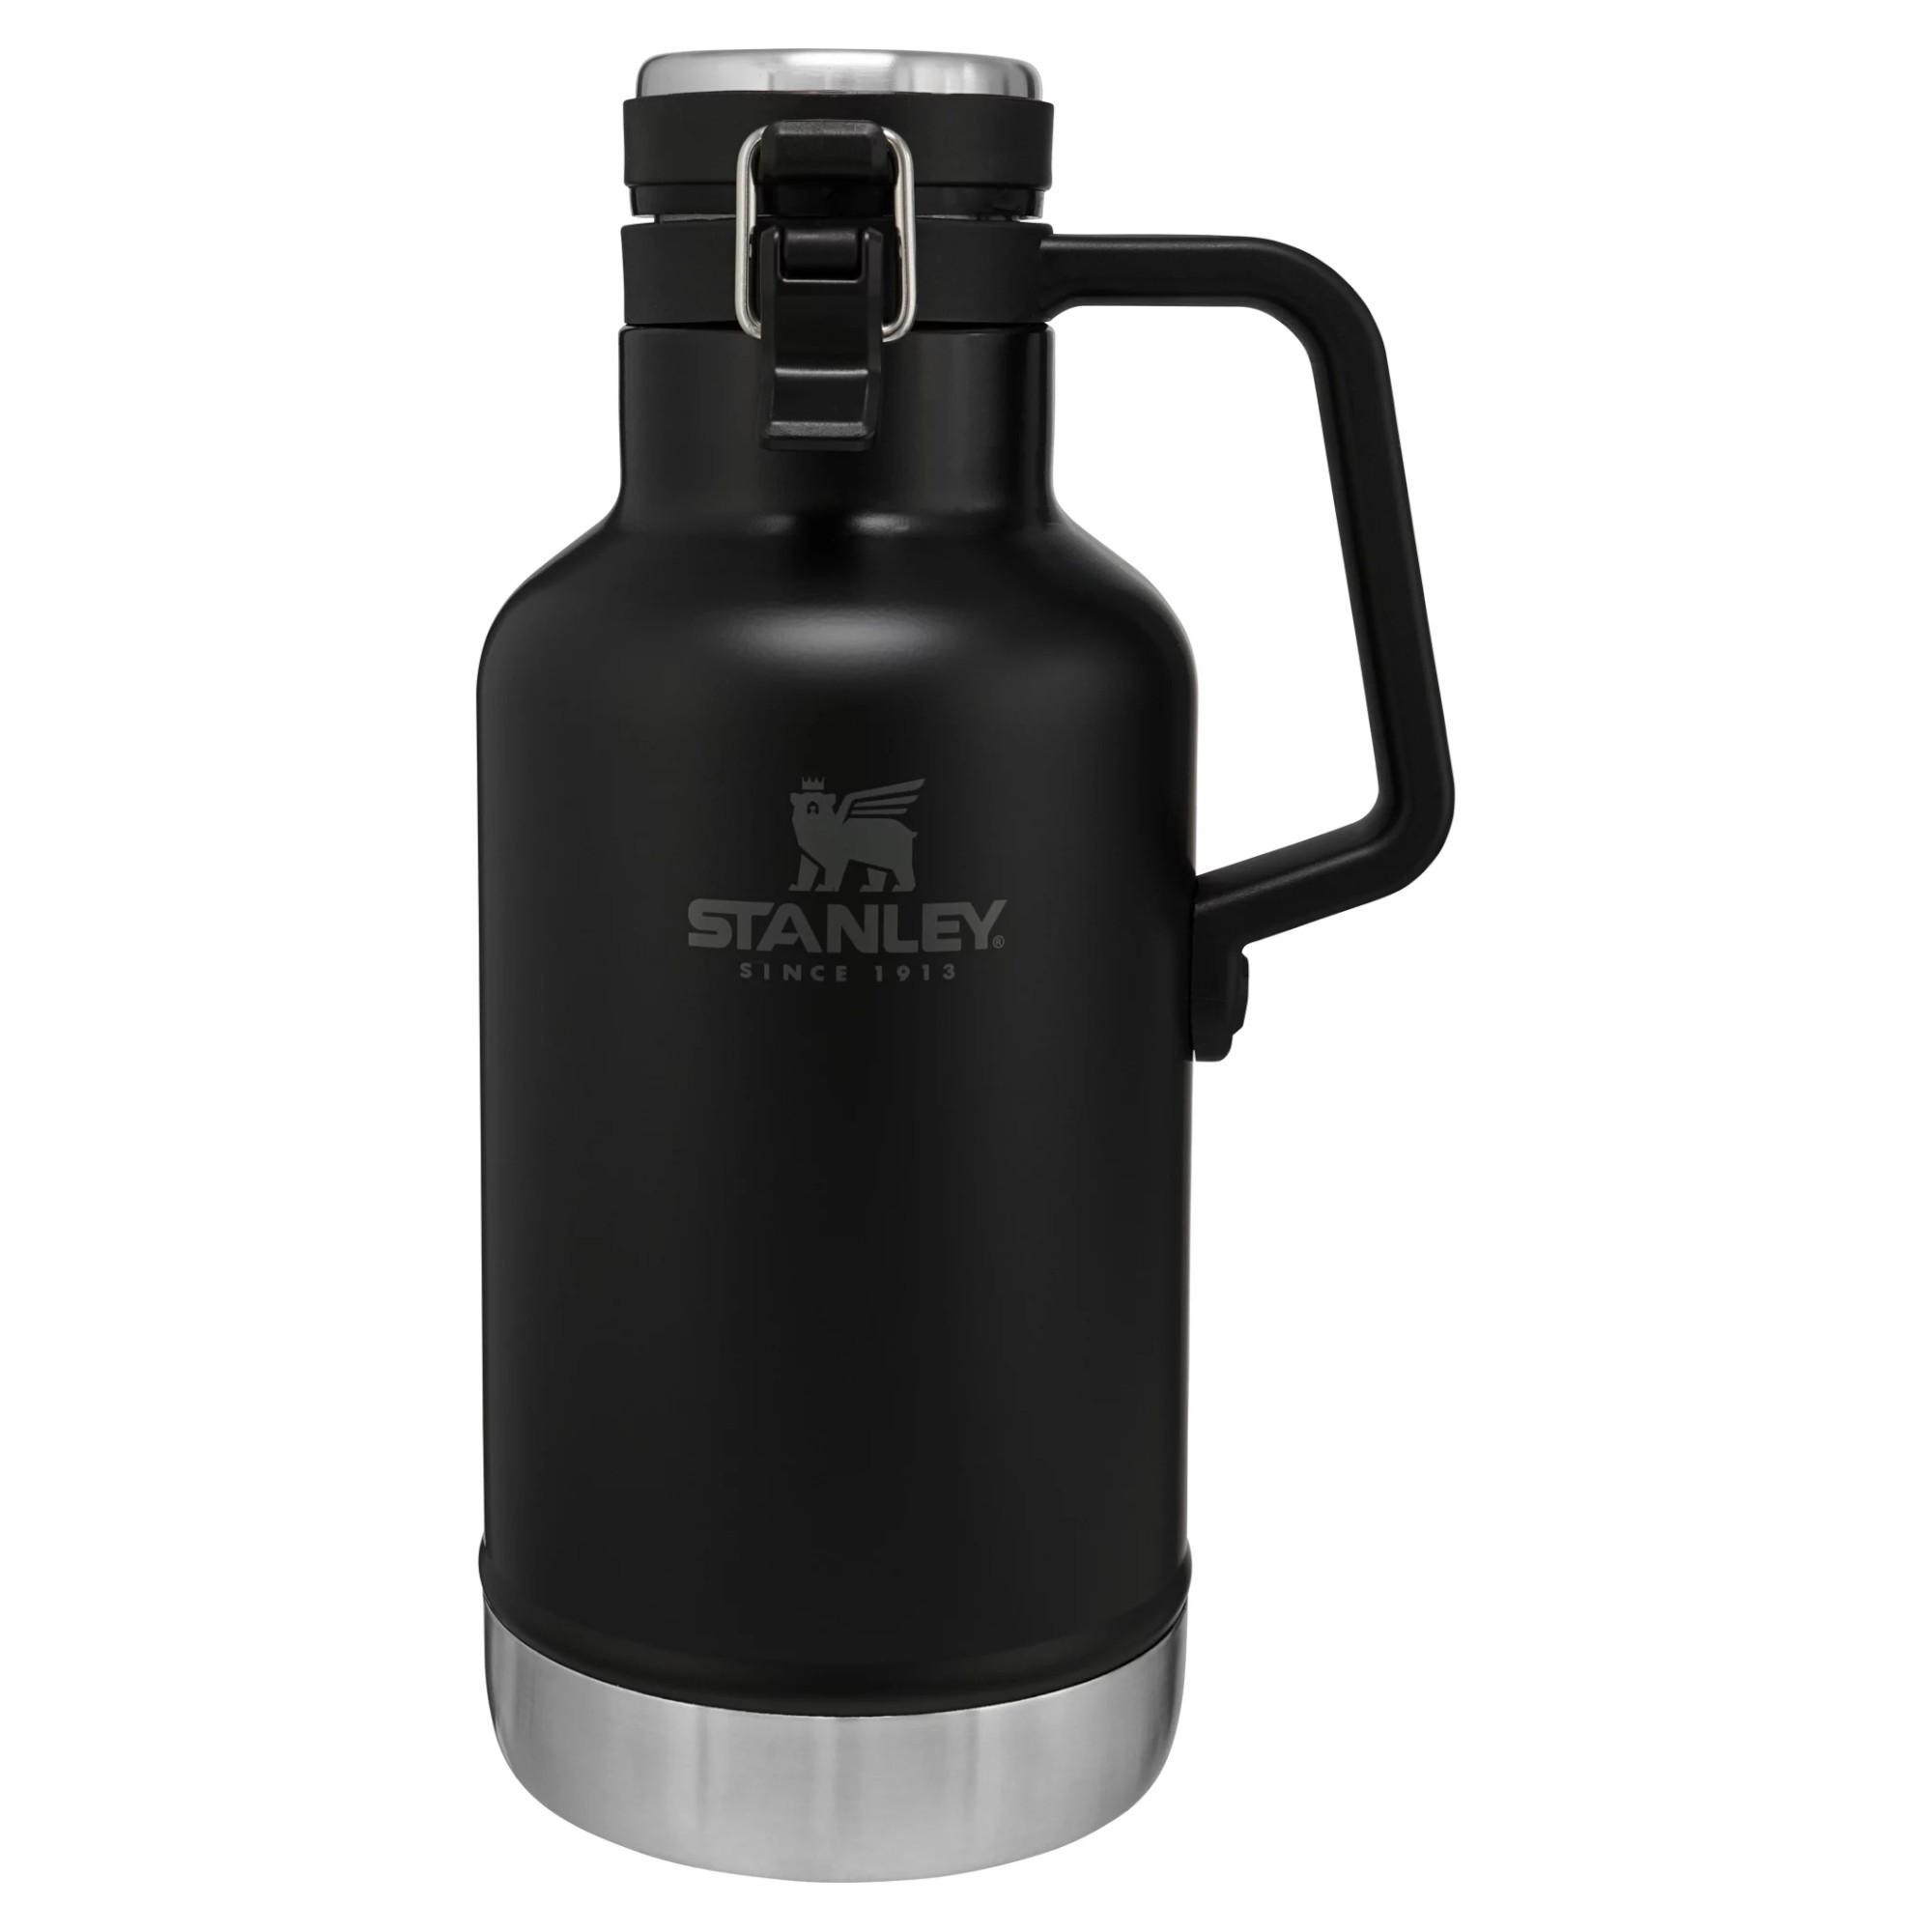 Garrafa Térmica Growler Clássico Vacuum Frio/Quente 1,9L Cerveja/Líquidos - Stanley